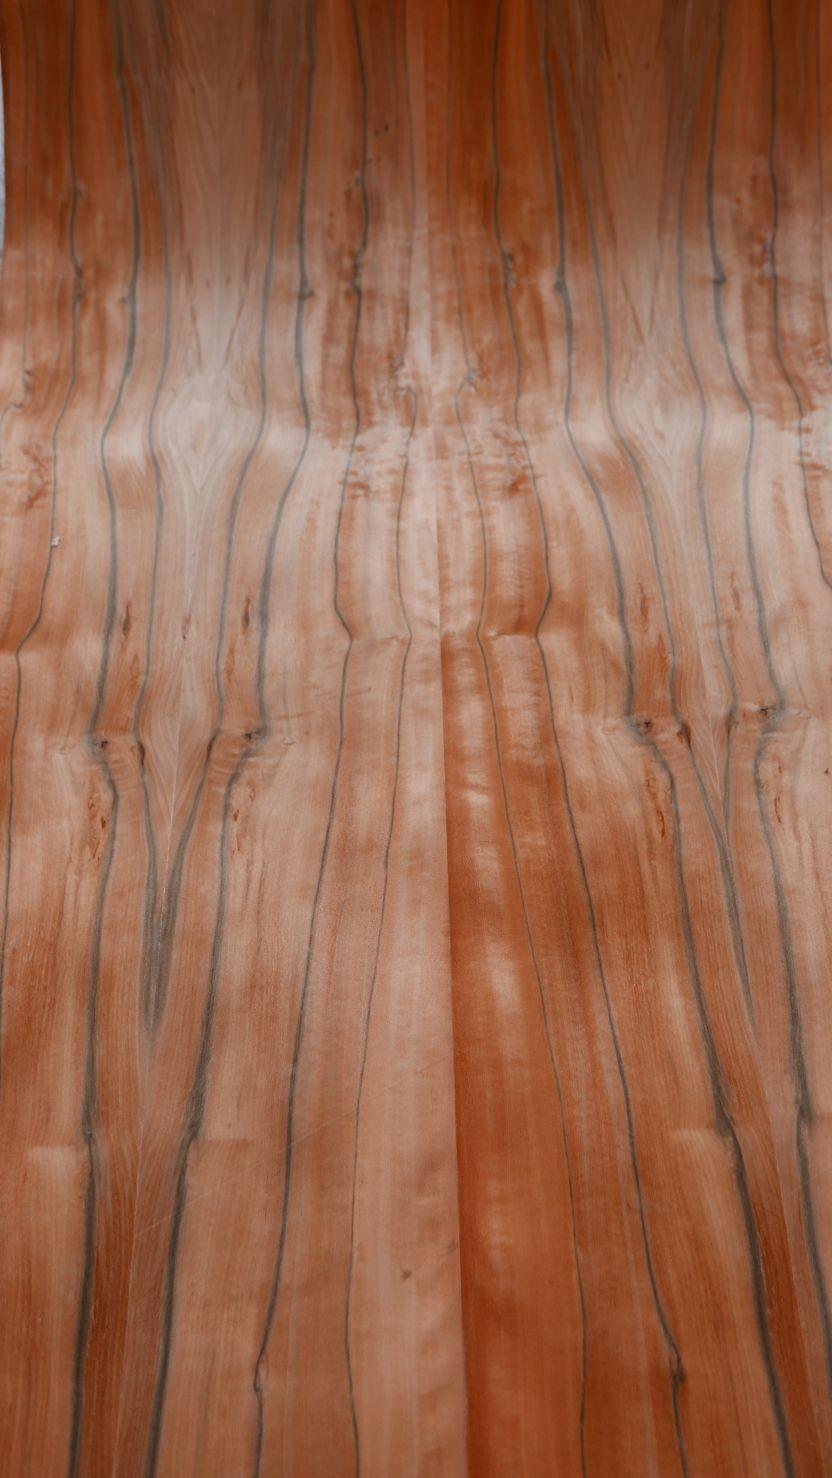 A0272-4 Tineo Gevoegd 62x150cm 5st